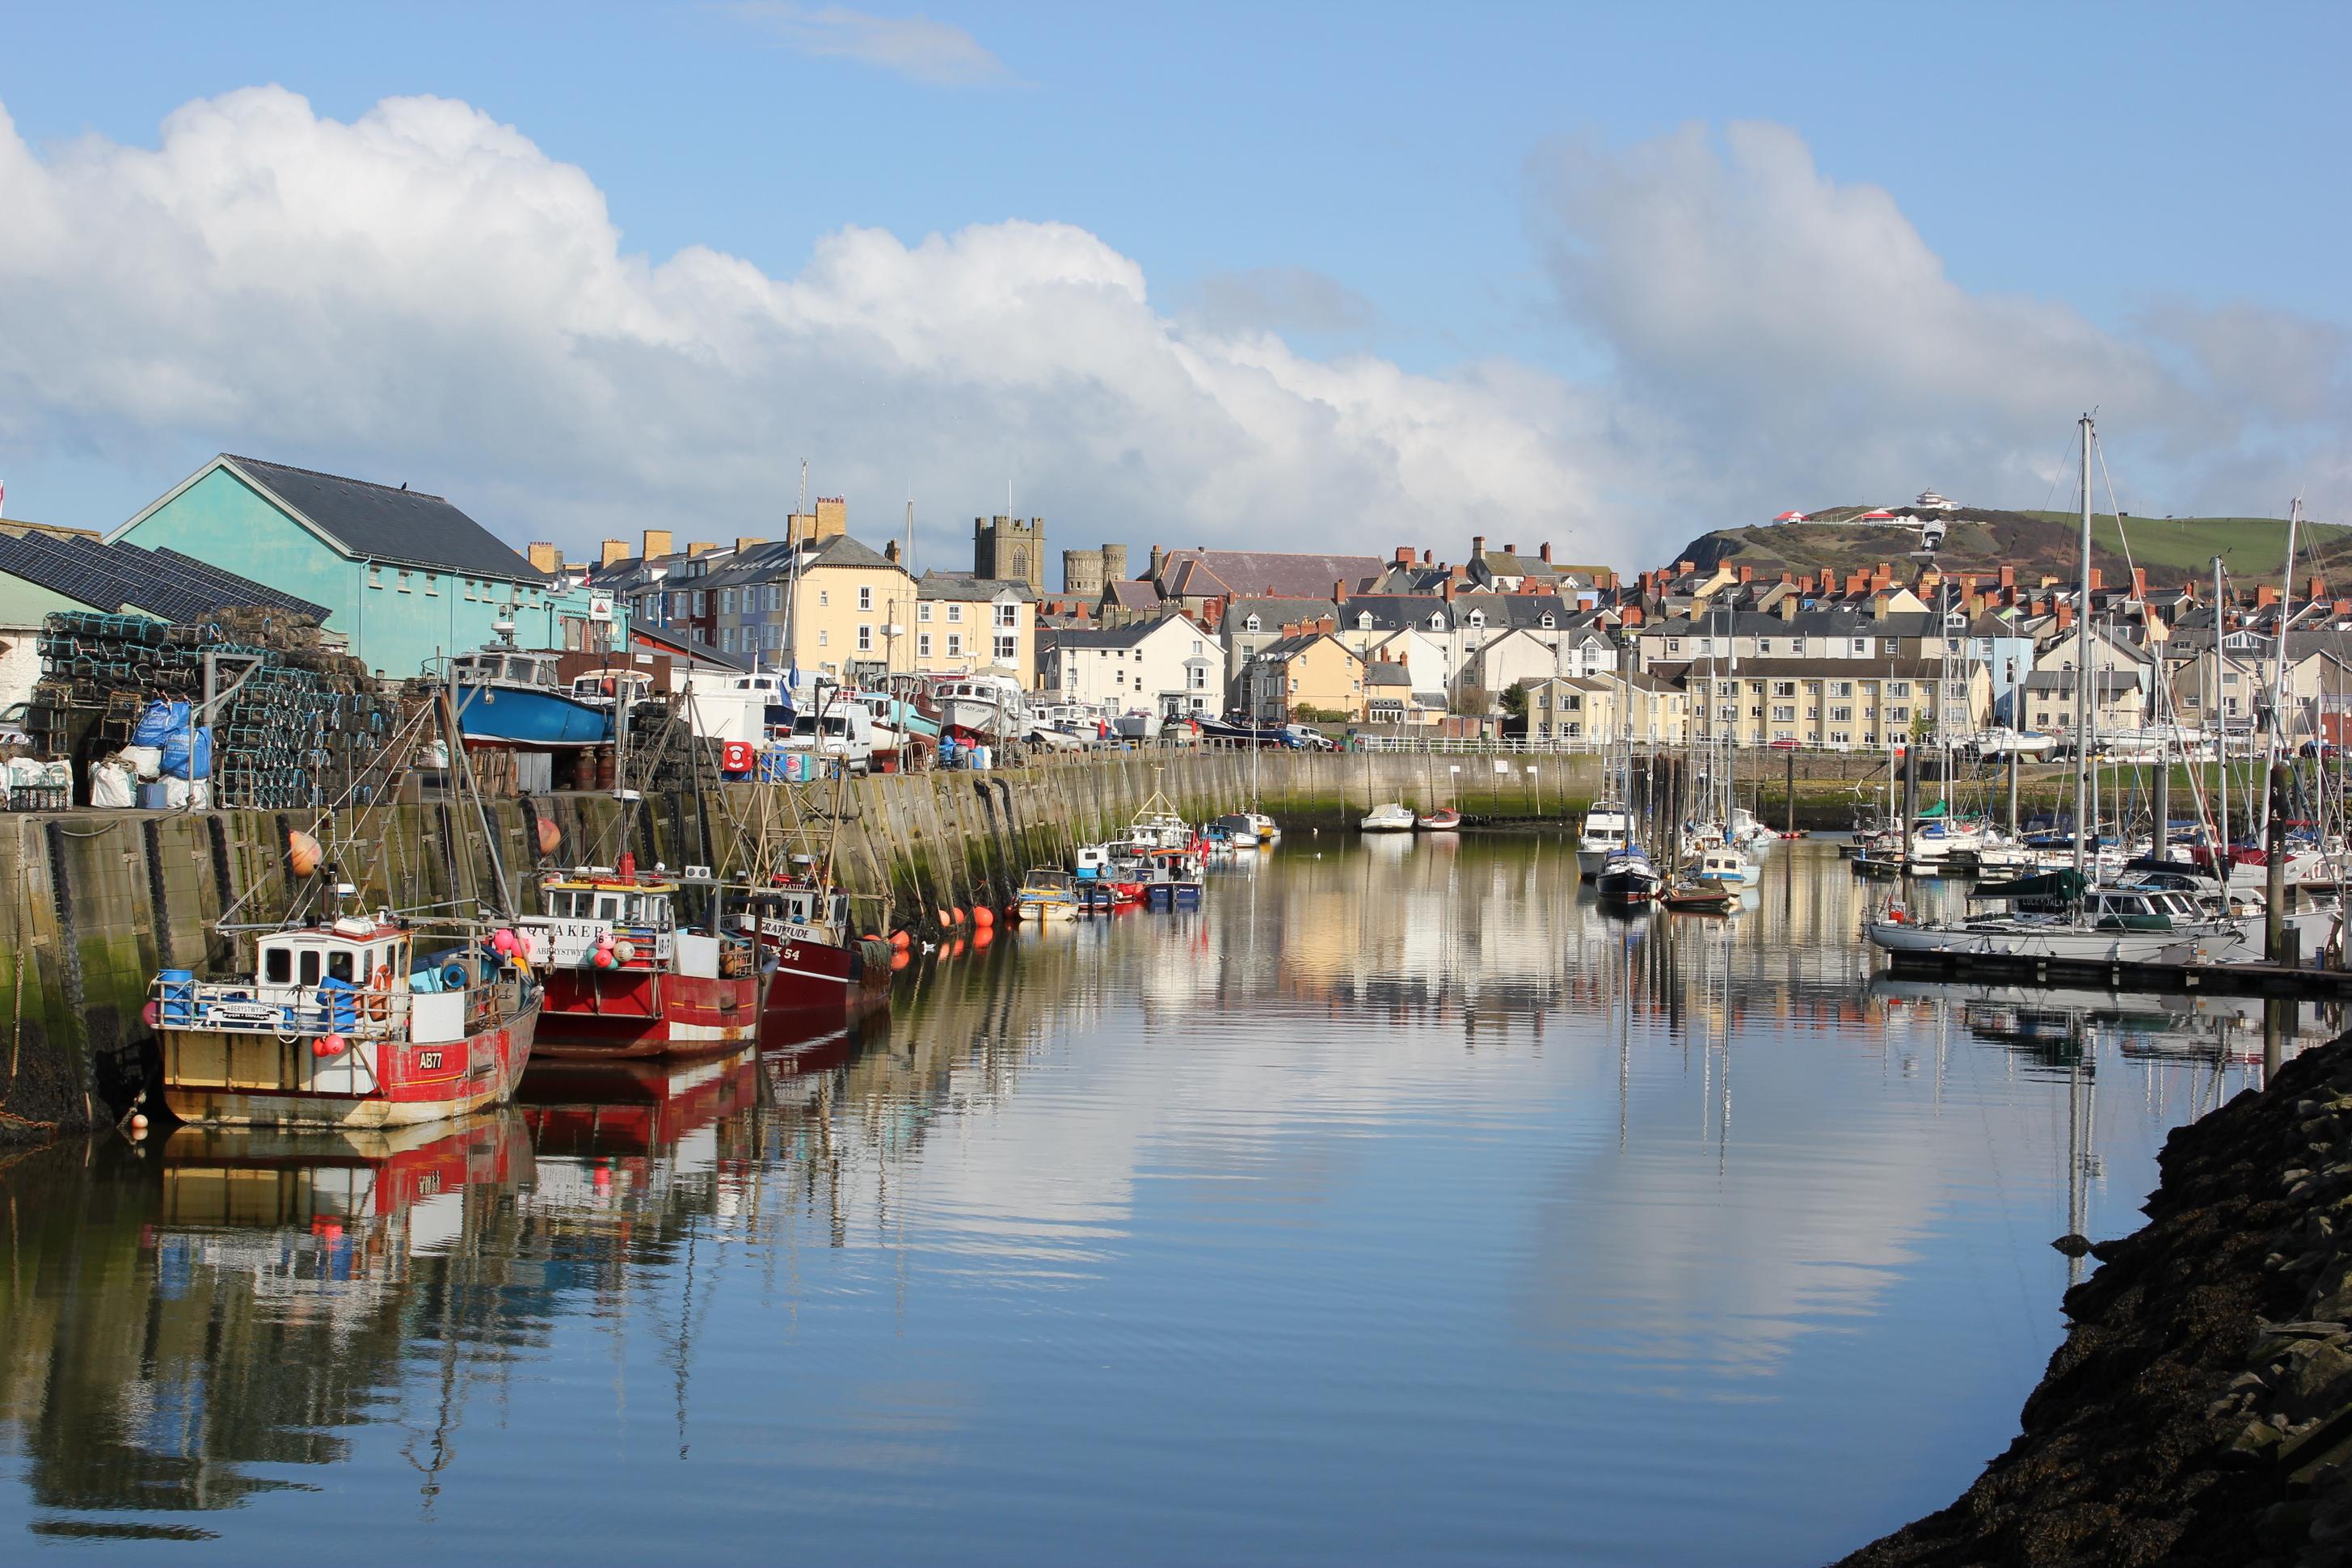 File:Aberystwyth Hafen.JPG - Wikimedia Commons